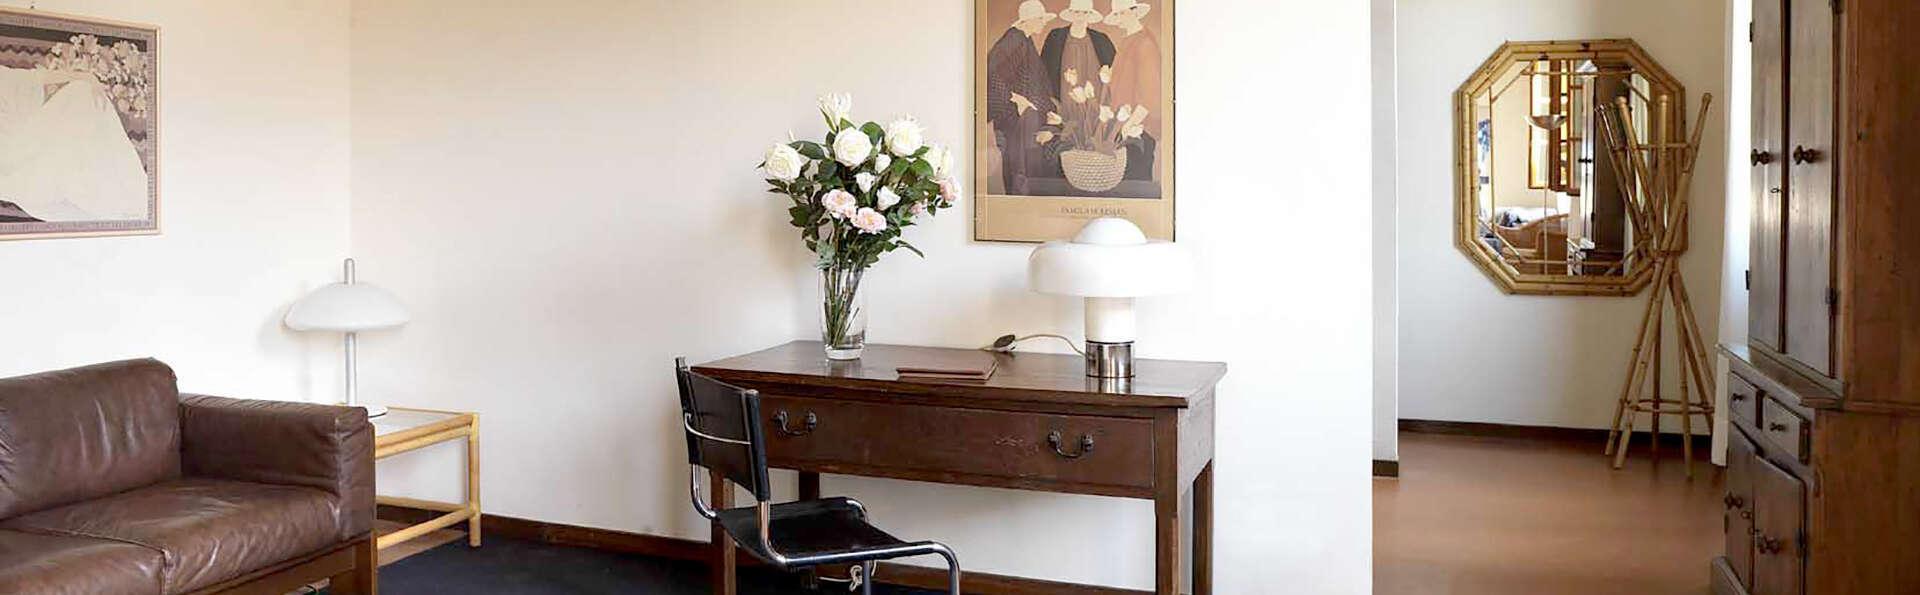 Hotel Palazzo Ricasoli - Edit_Room0.jpg